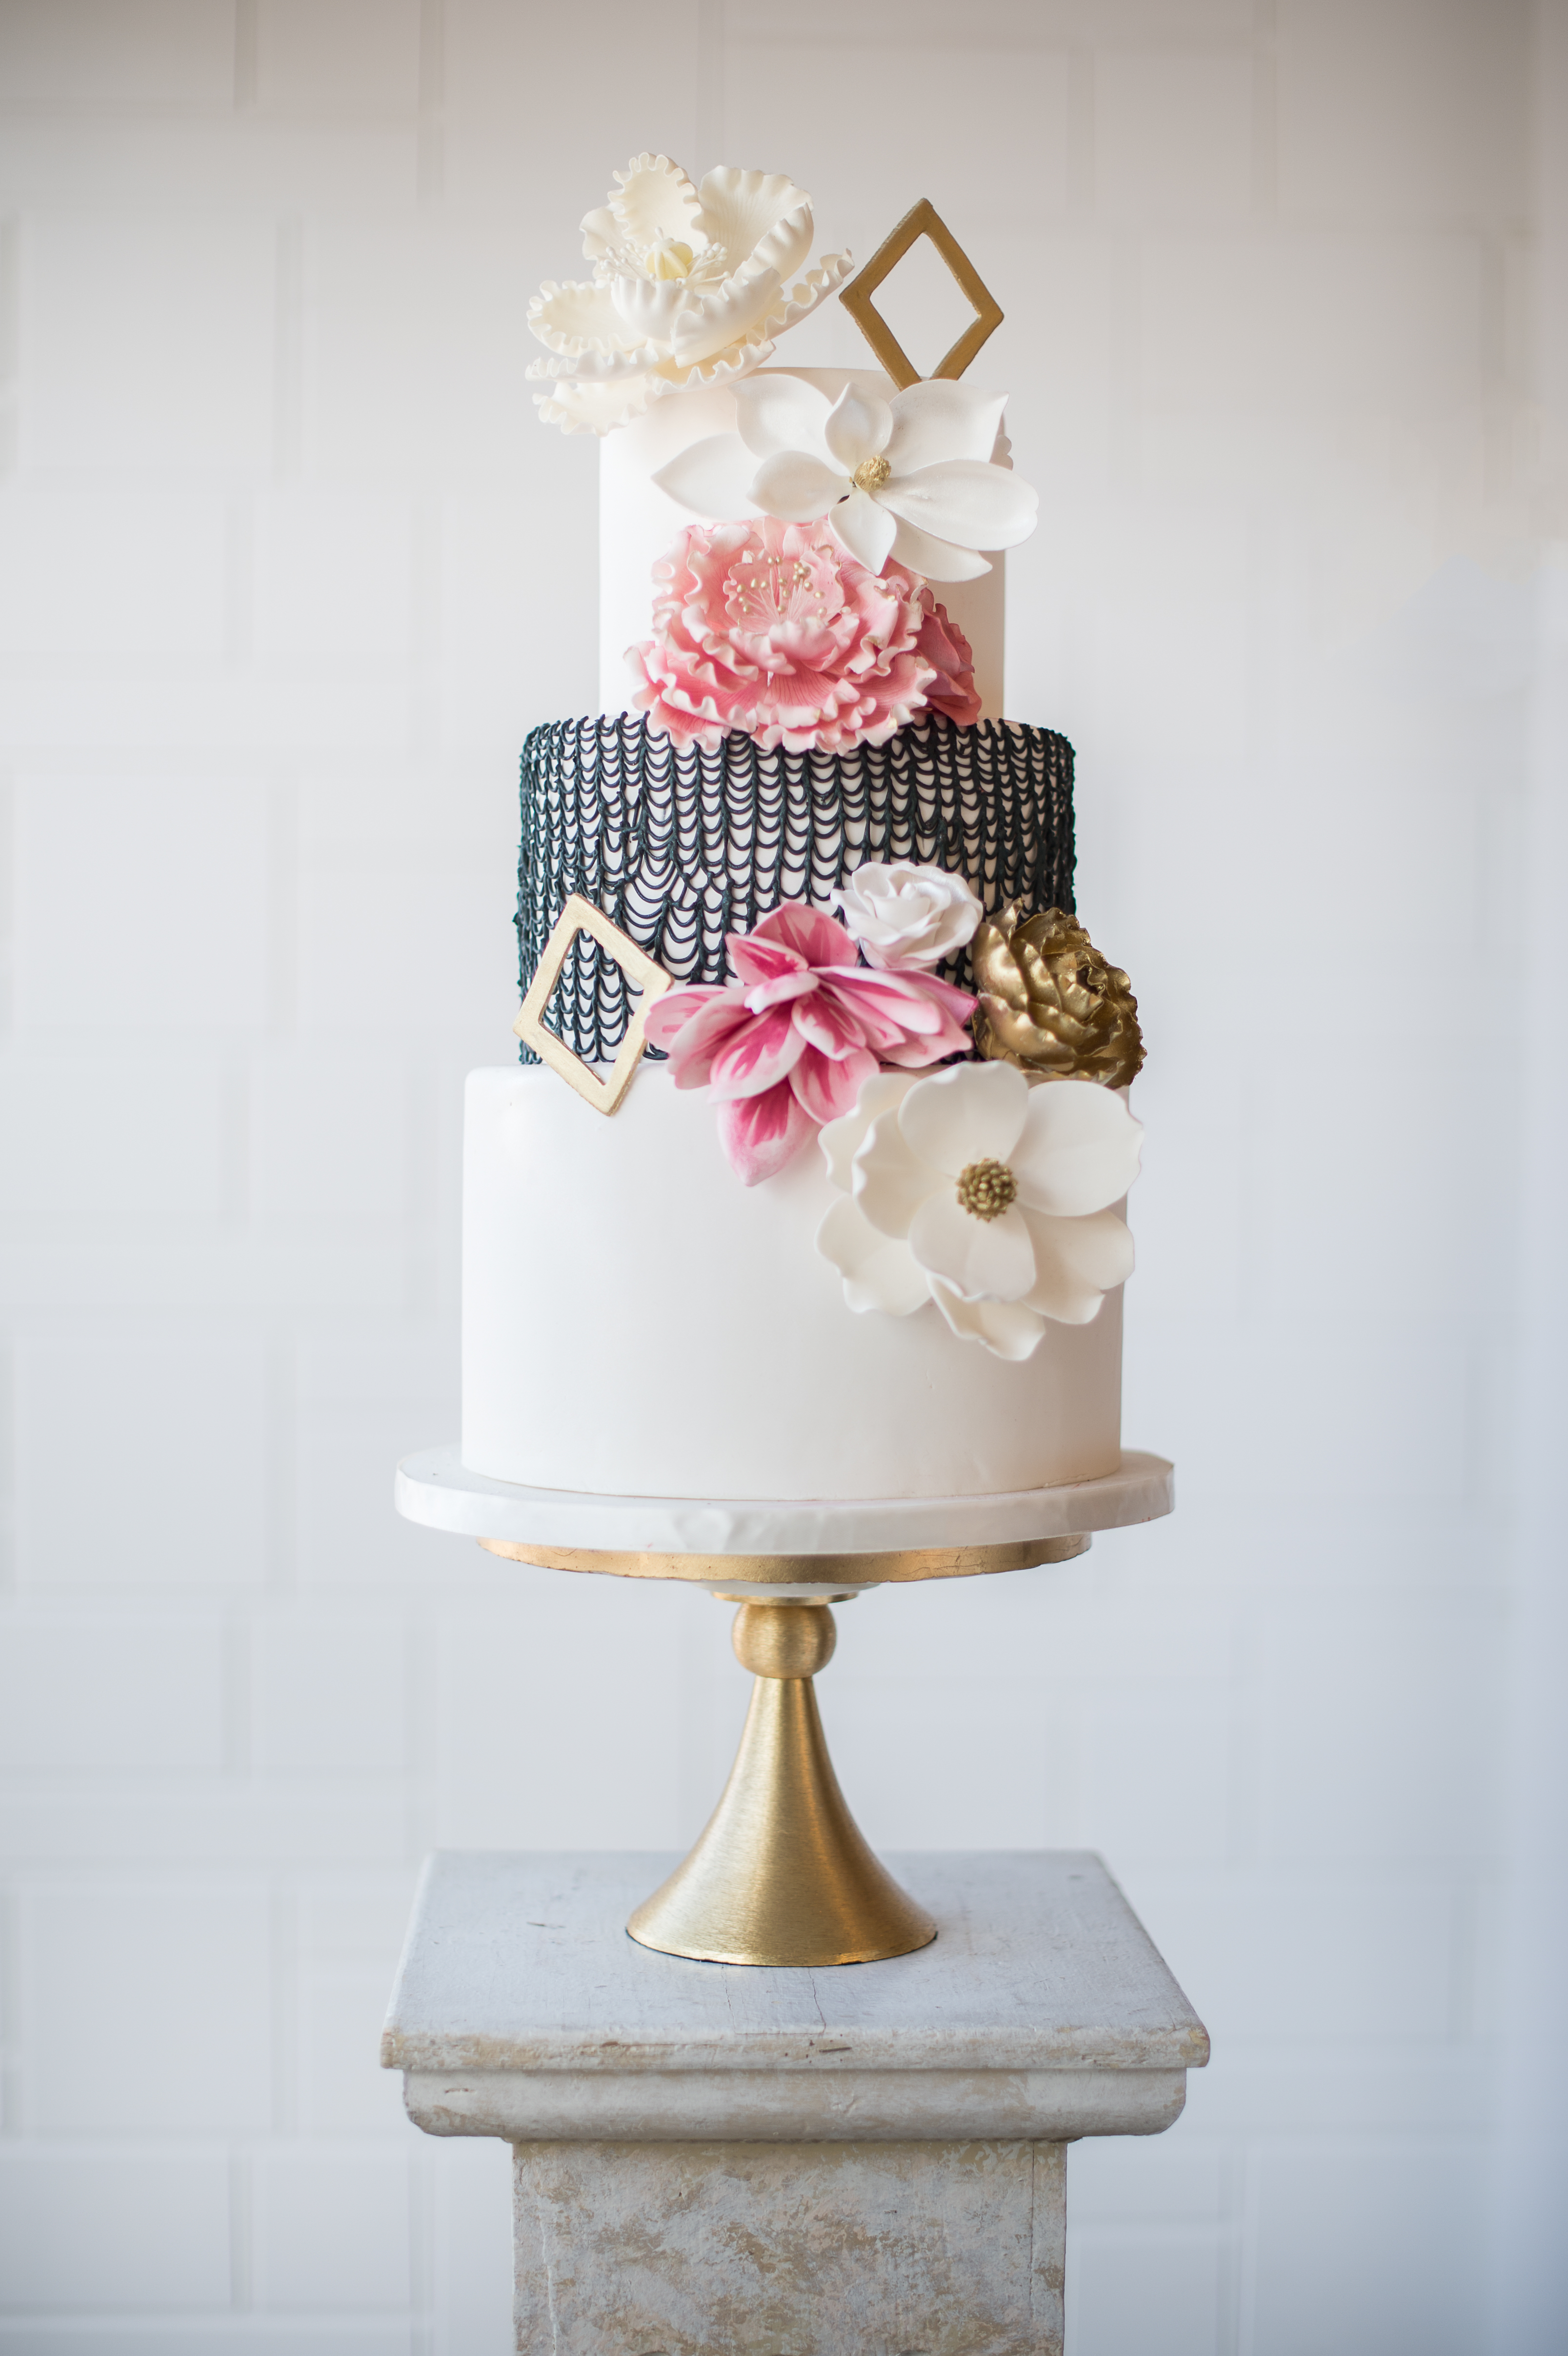 Ivory with black wedding cake with geometric shape and sugar flowers